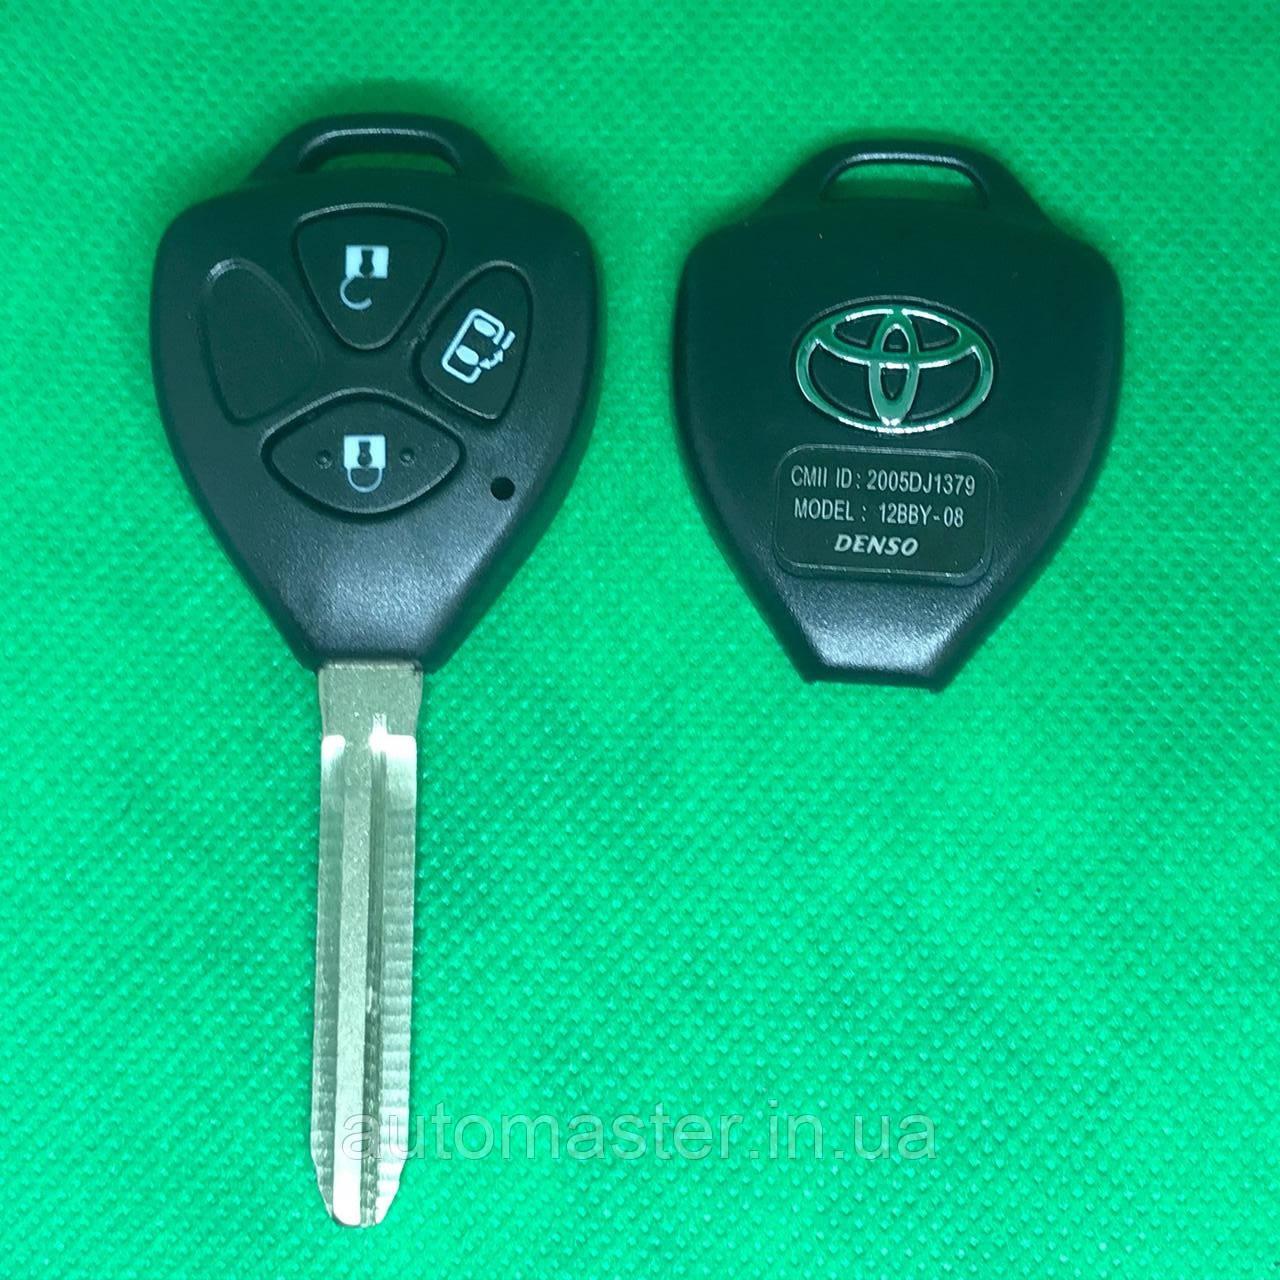 Корпус автоключа для Toyota RAV4, Corolla (Тойота РАВ4, Королла ) 3 кнопки, лезвие TOY43